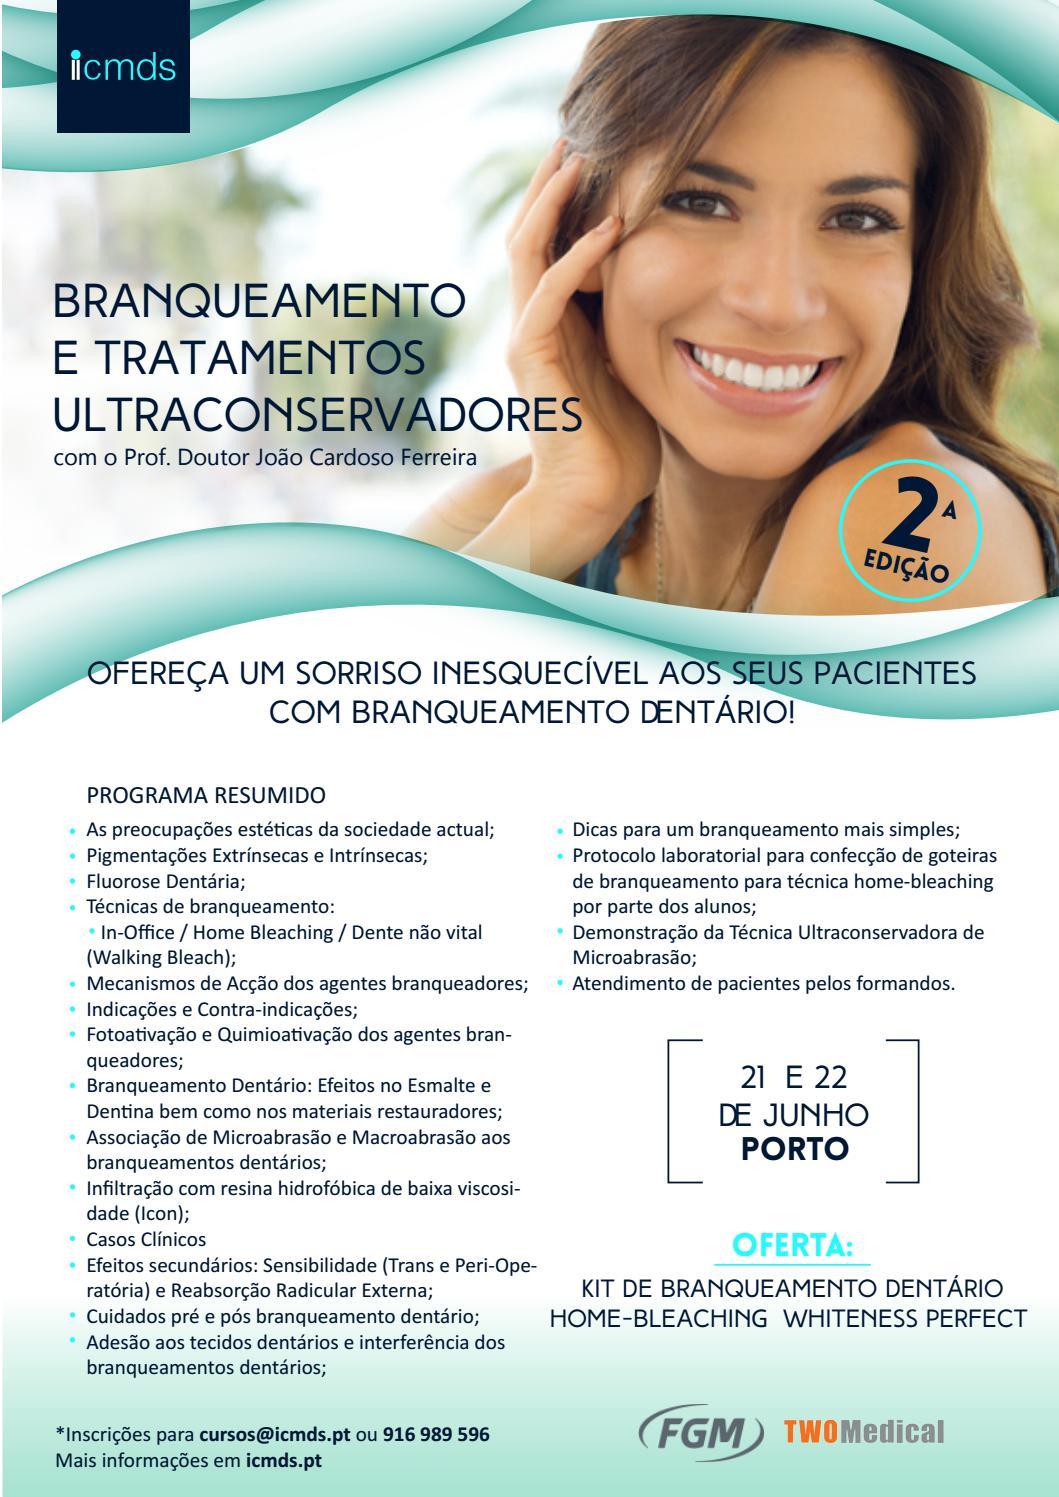 Branqueamento E Tratamentos Ultraconservadores By Two Medical Issuu